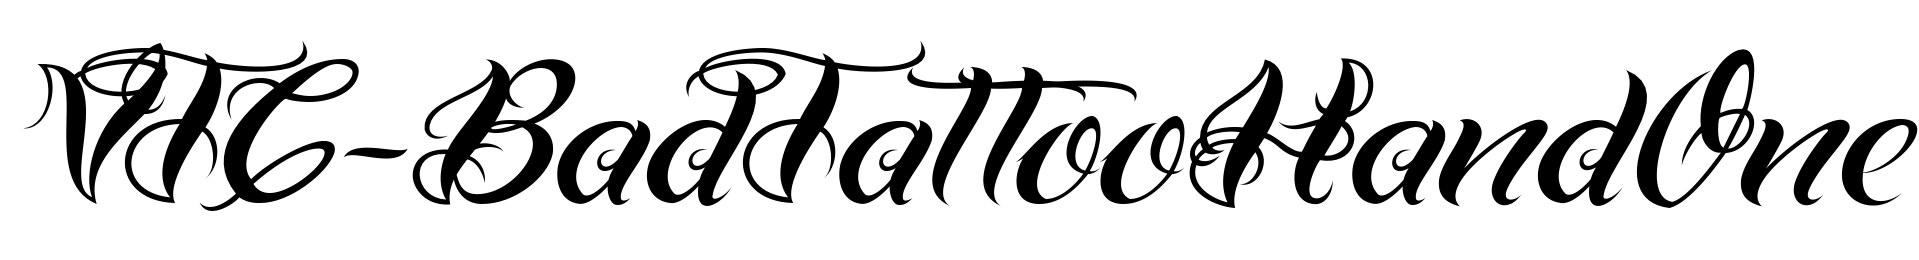 VTC-BadTattooHandOne